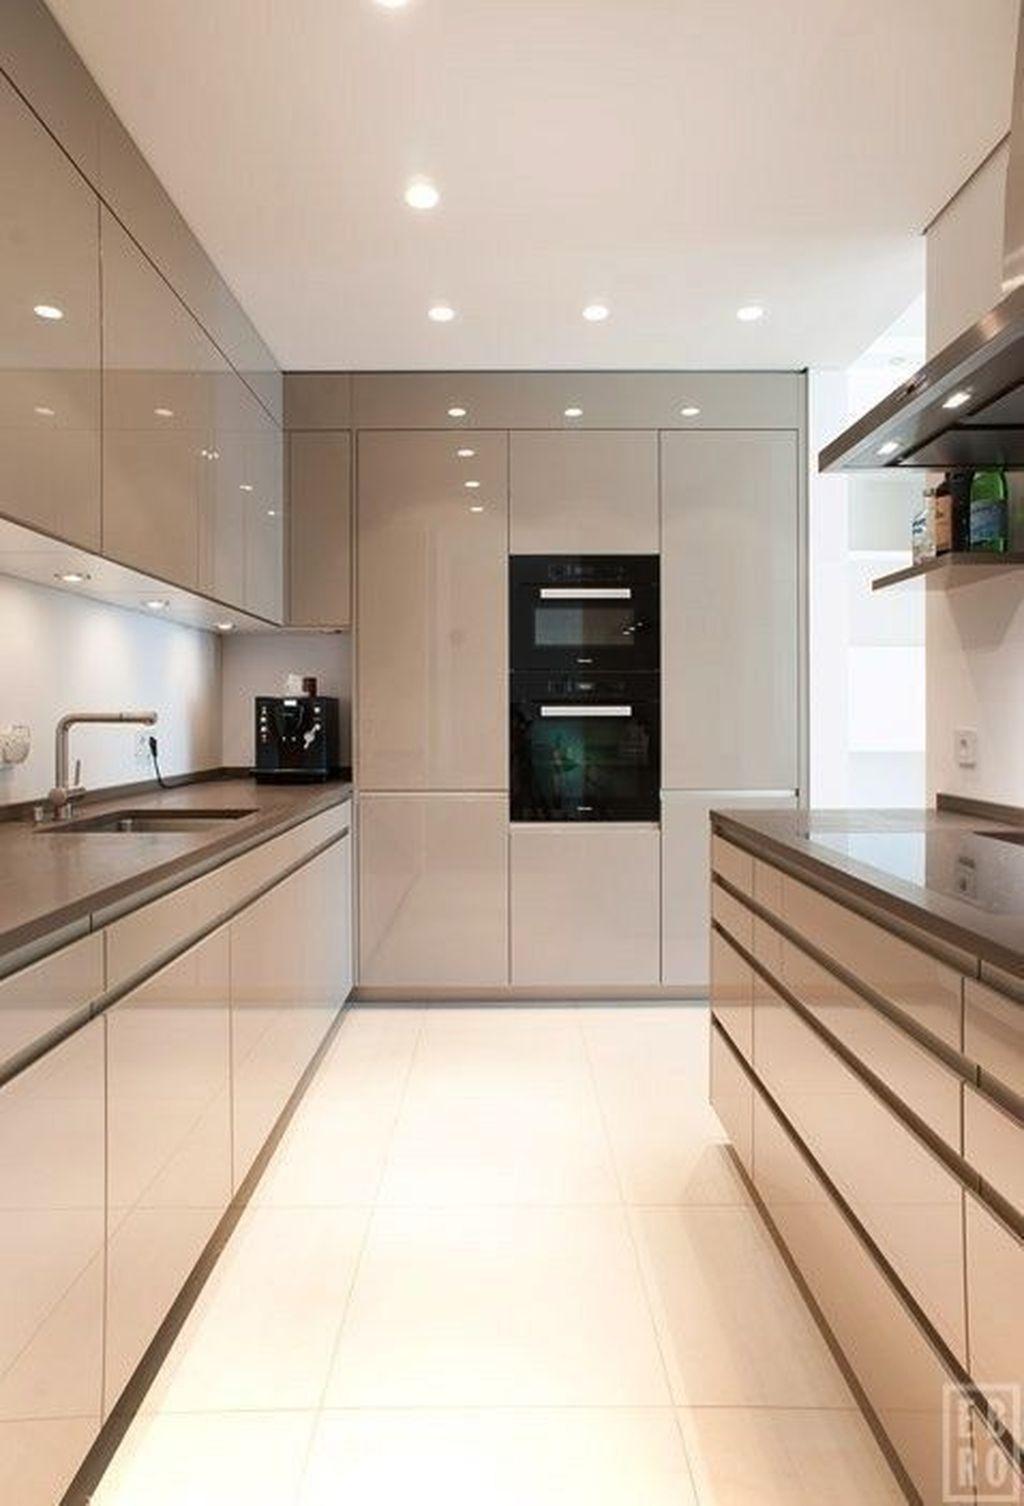 9 Fabulous Contemporary Kitchen Design And Decor Ideas ...